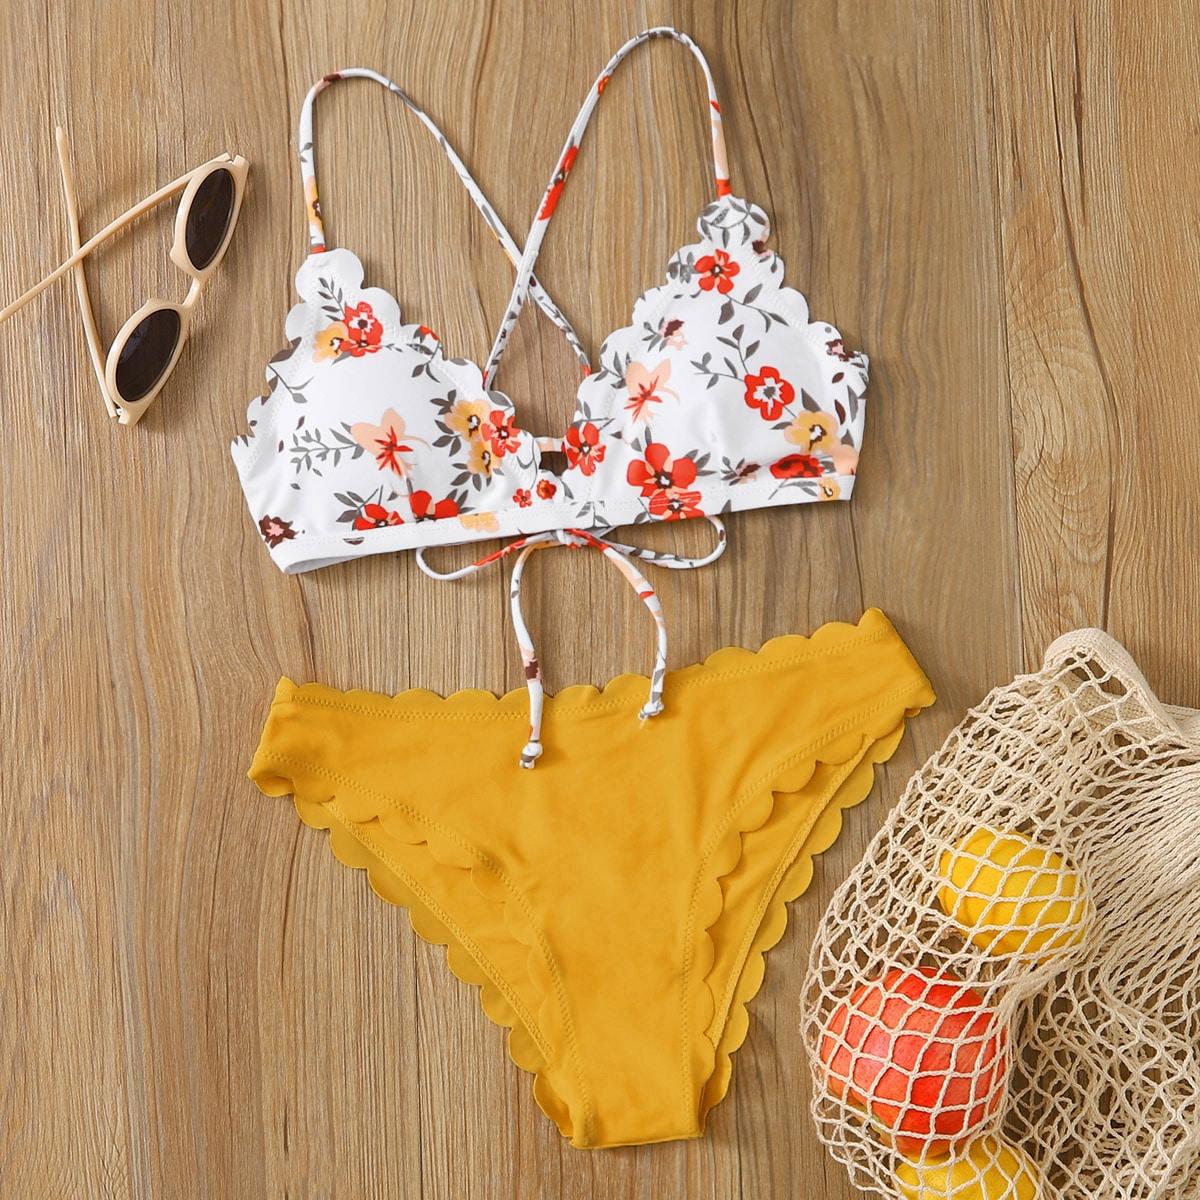 SHEIN / Bañador bikini de espalda con cordón ribete en abanico floral